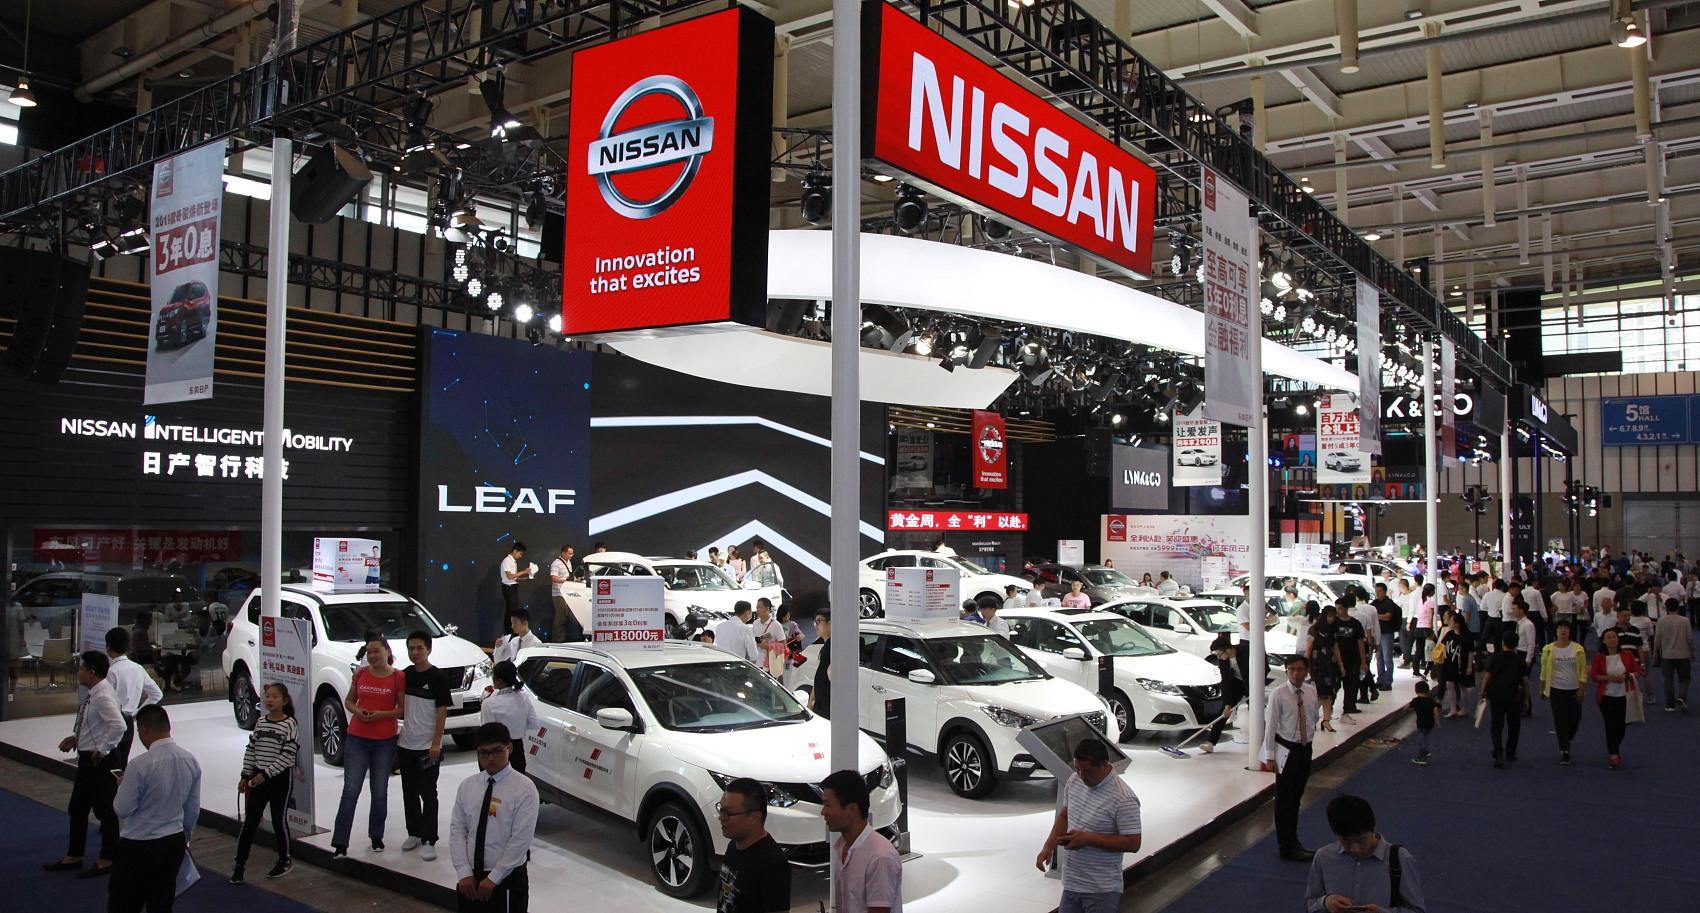 Nikkei opens lower on Wall Street's decline, Nissan falls 6 pct. following arrest of Ghosn